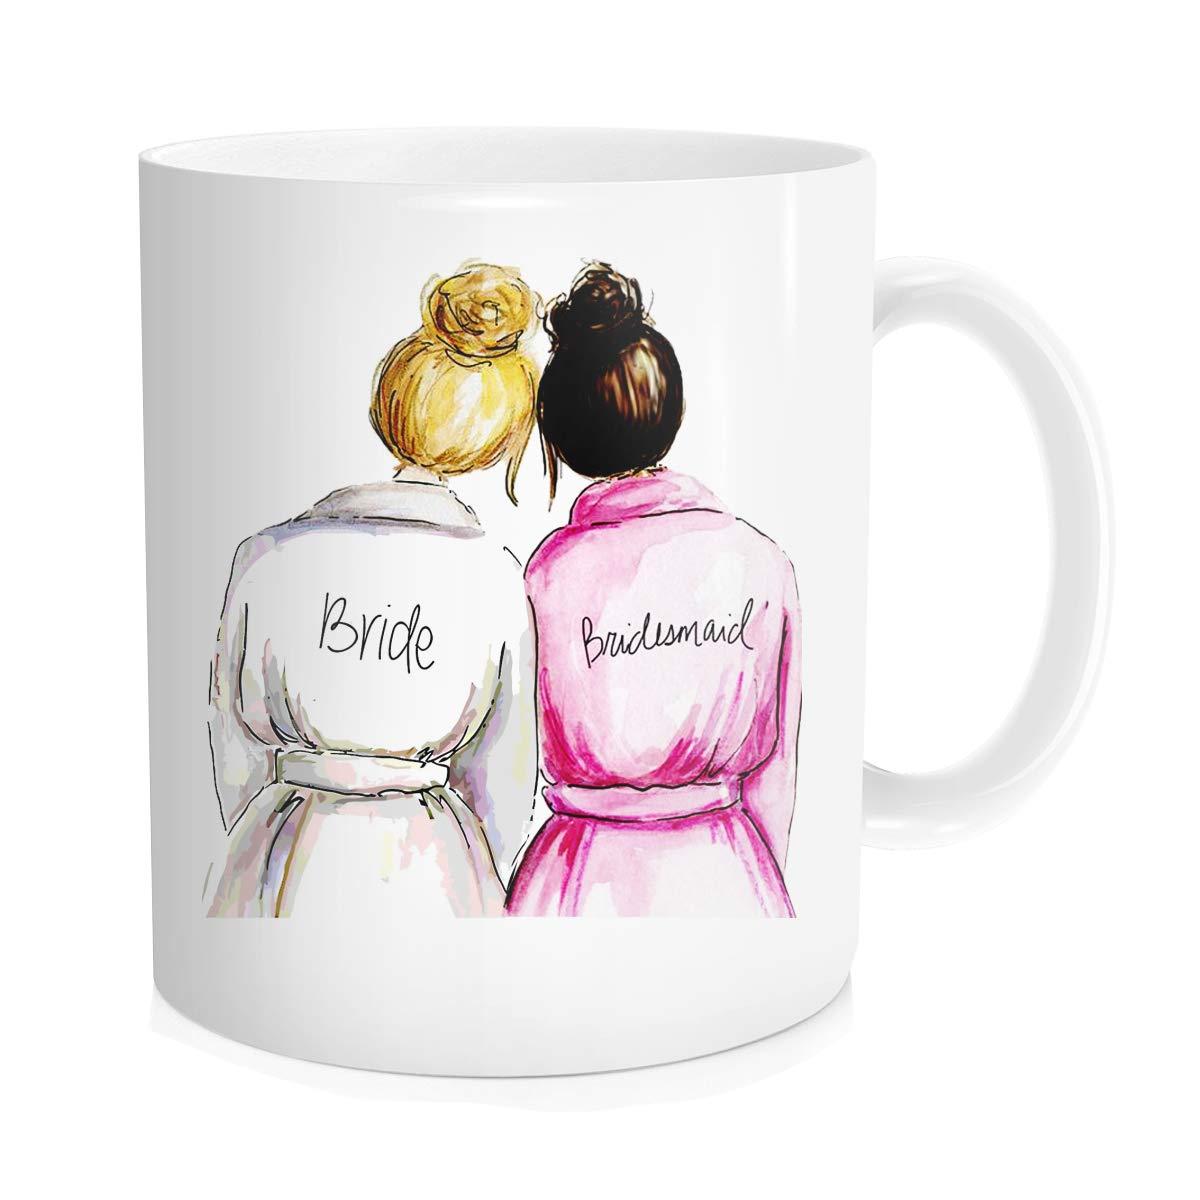 Wedding for Bridesmaid from Bride, Funny Coffee Mug Tea Cup, White Ceramic 11 oz